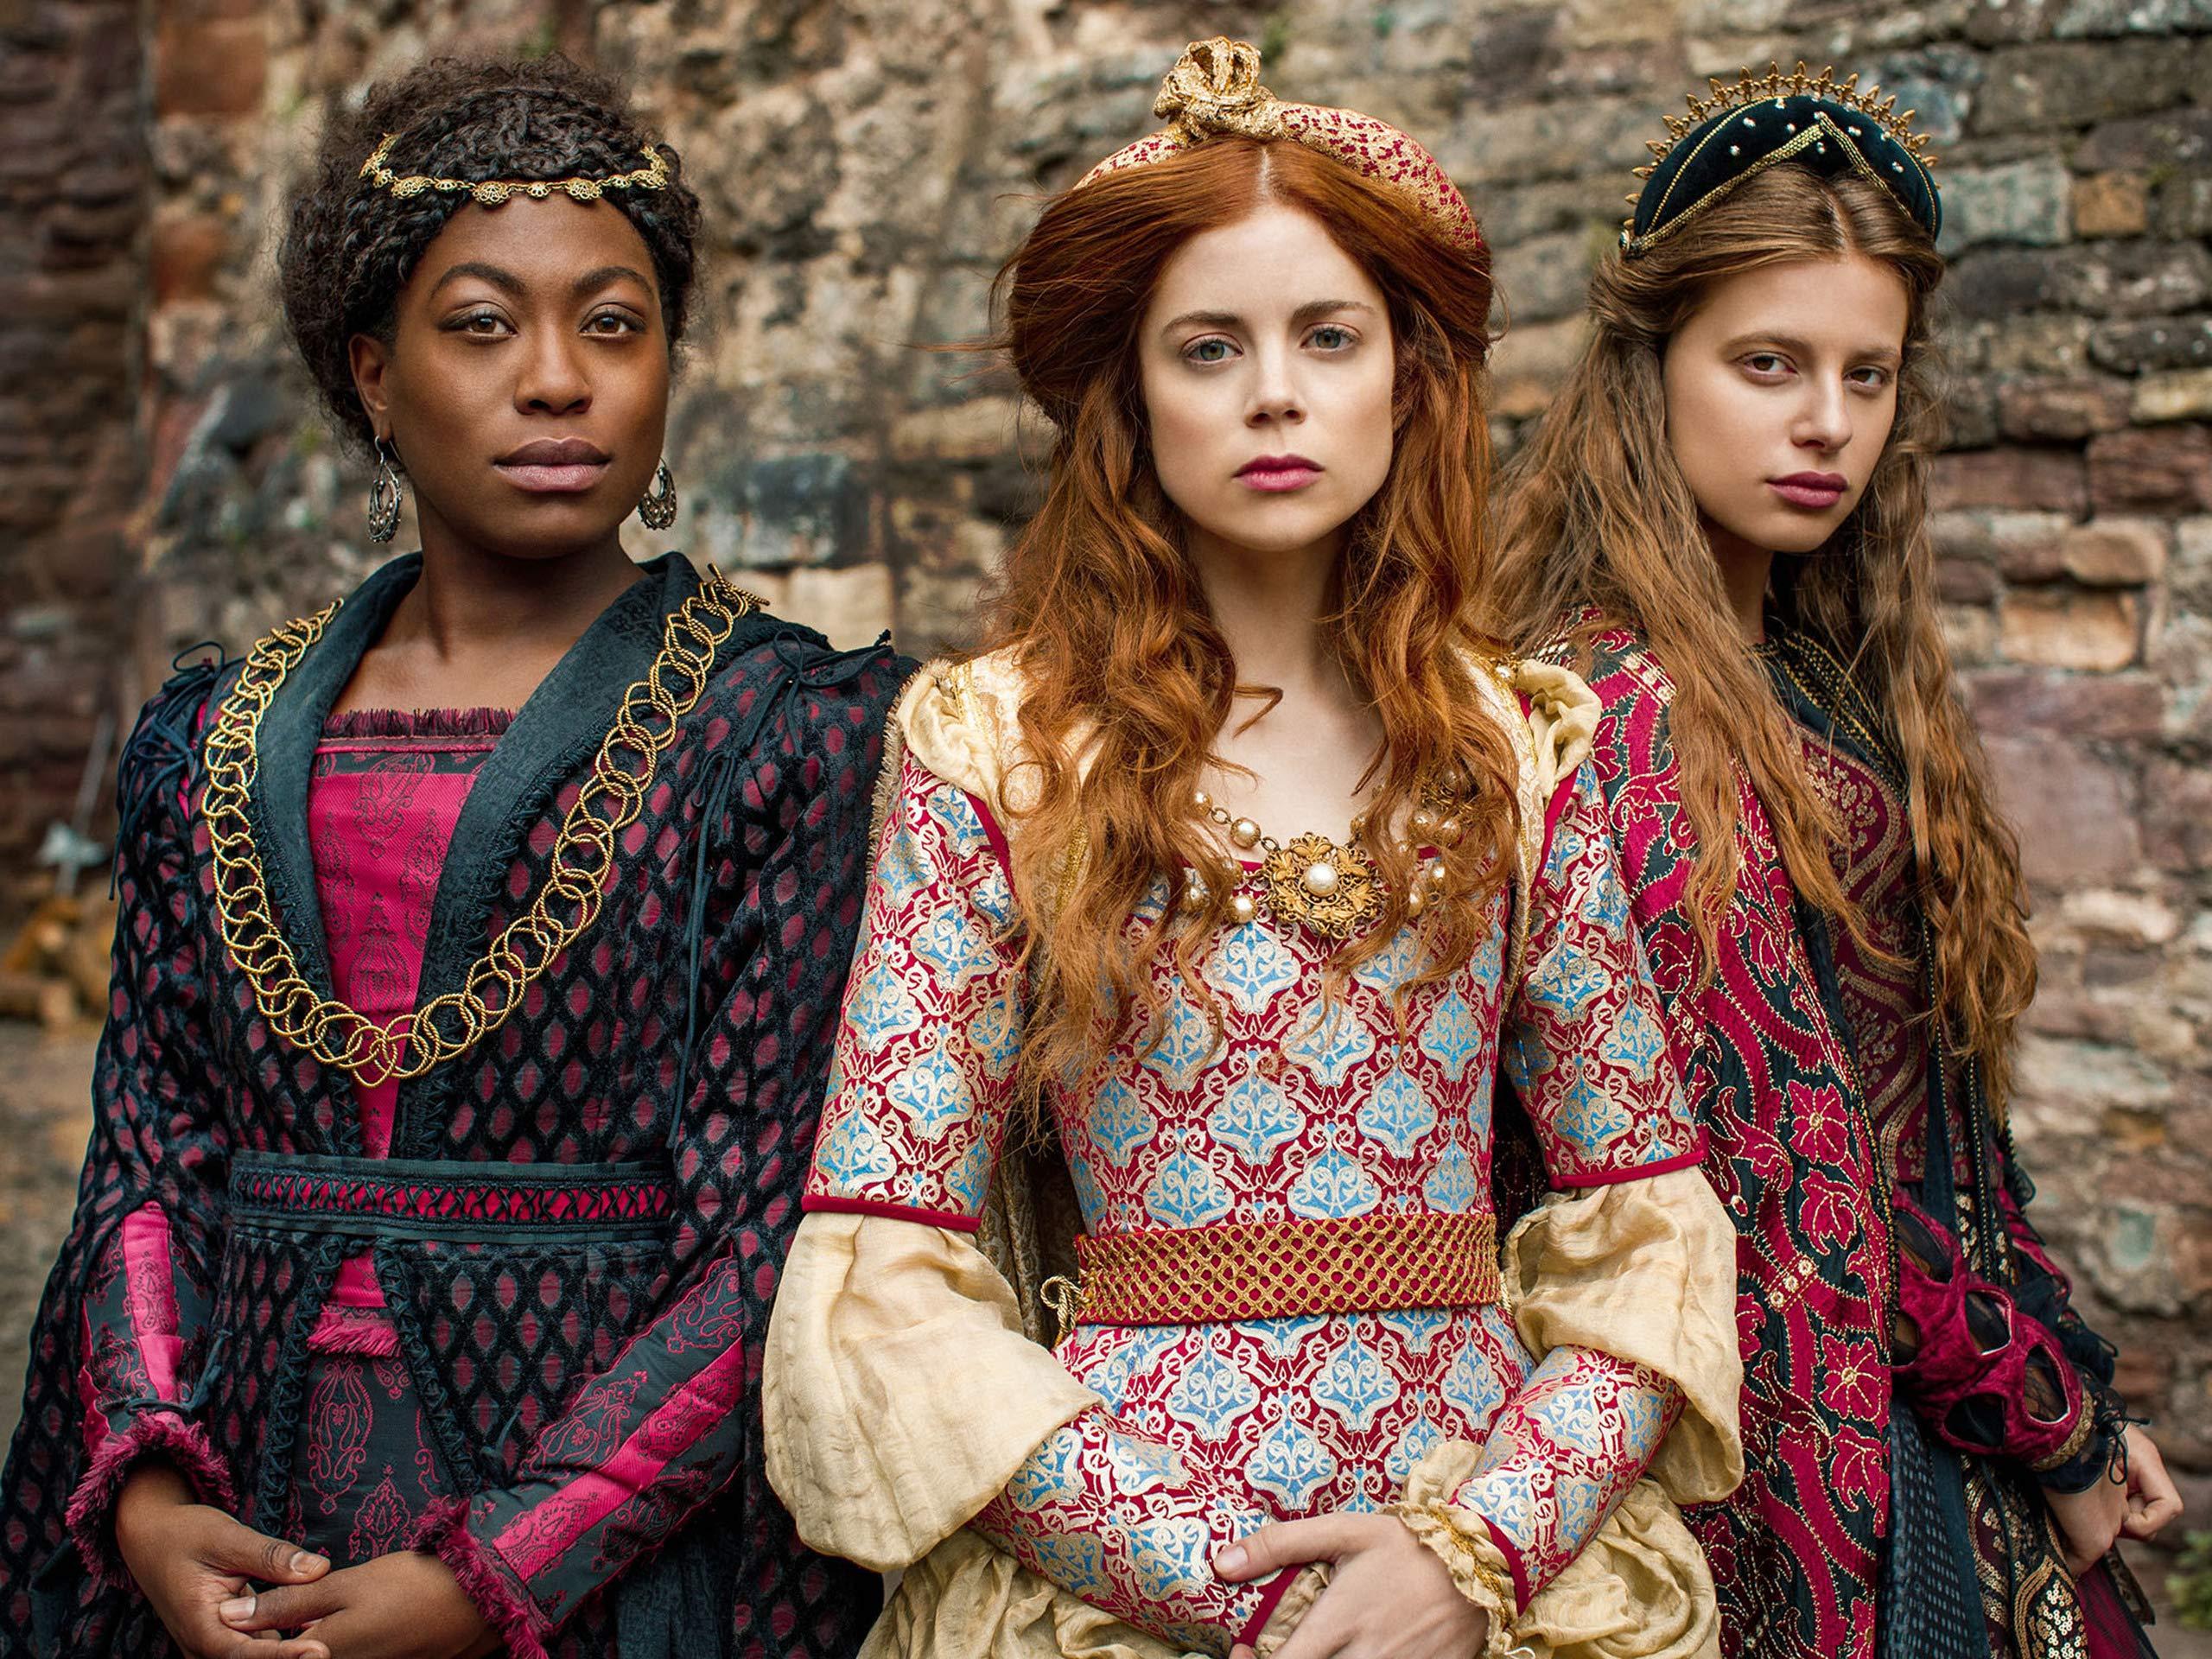 Amazon.de: The Spanish Princess - Staffel 1 ansehen